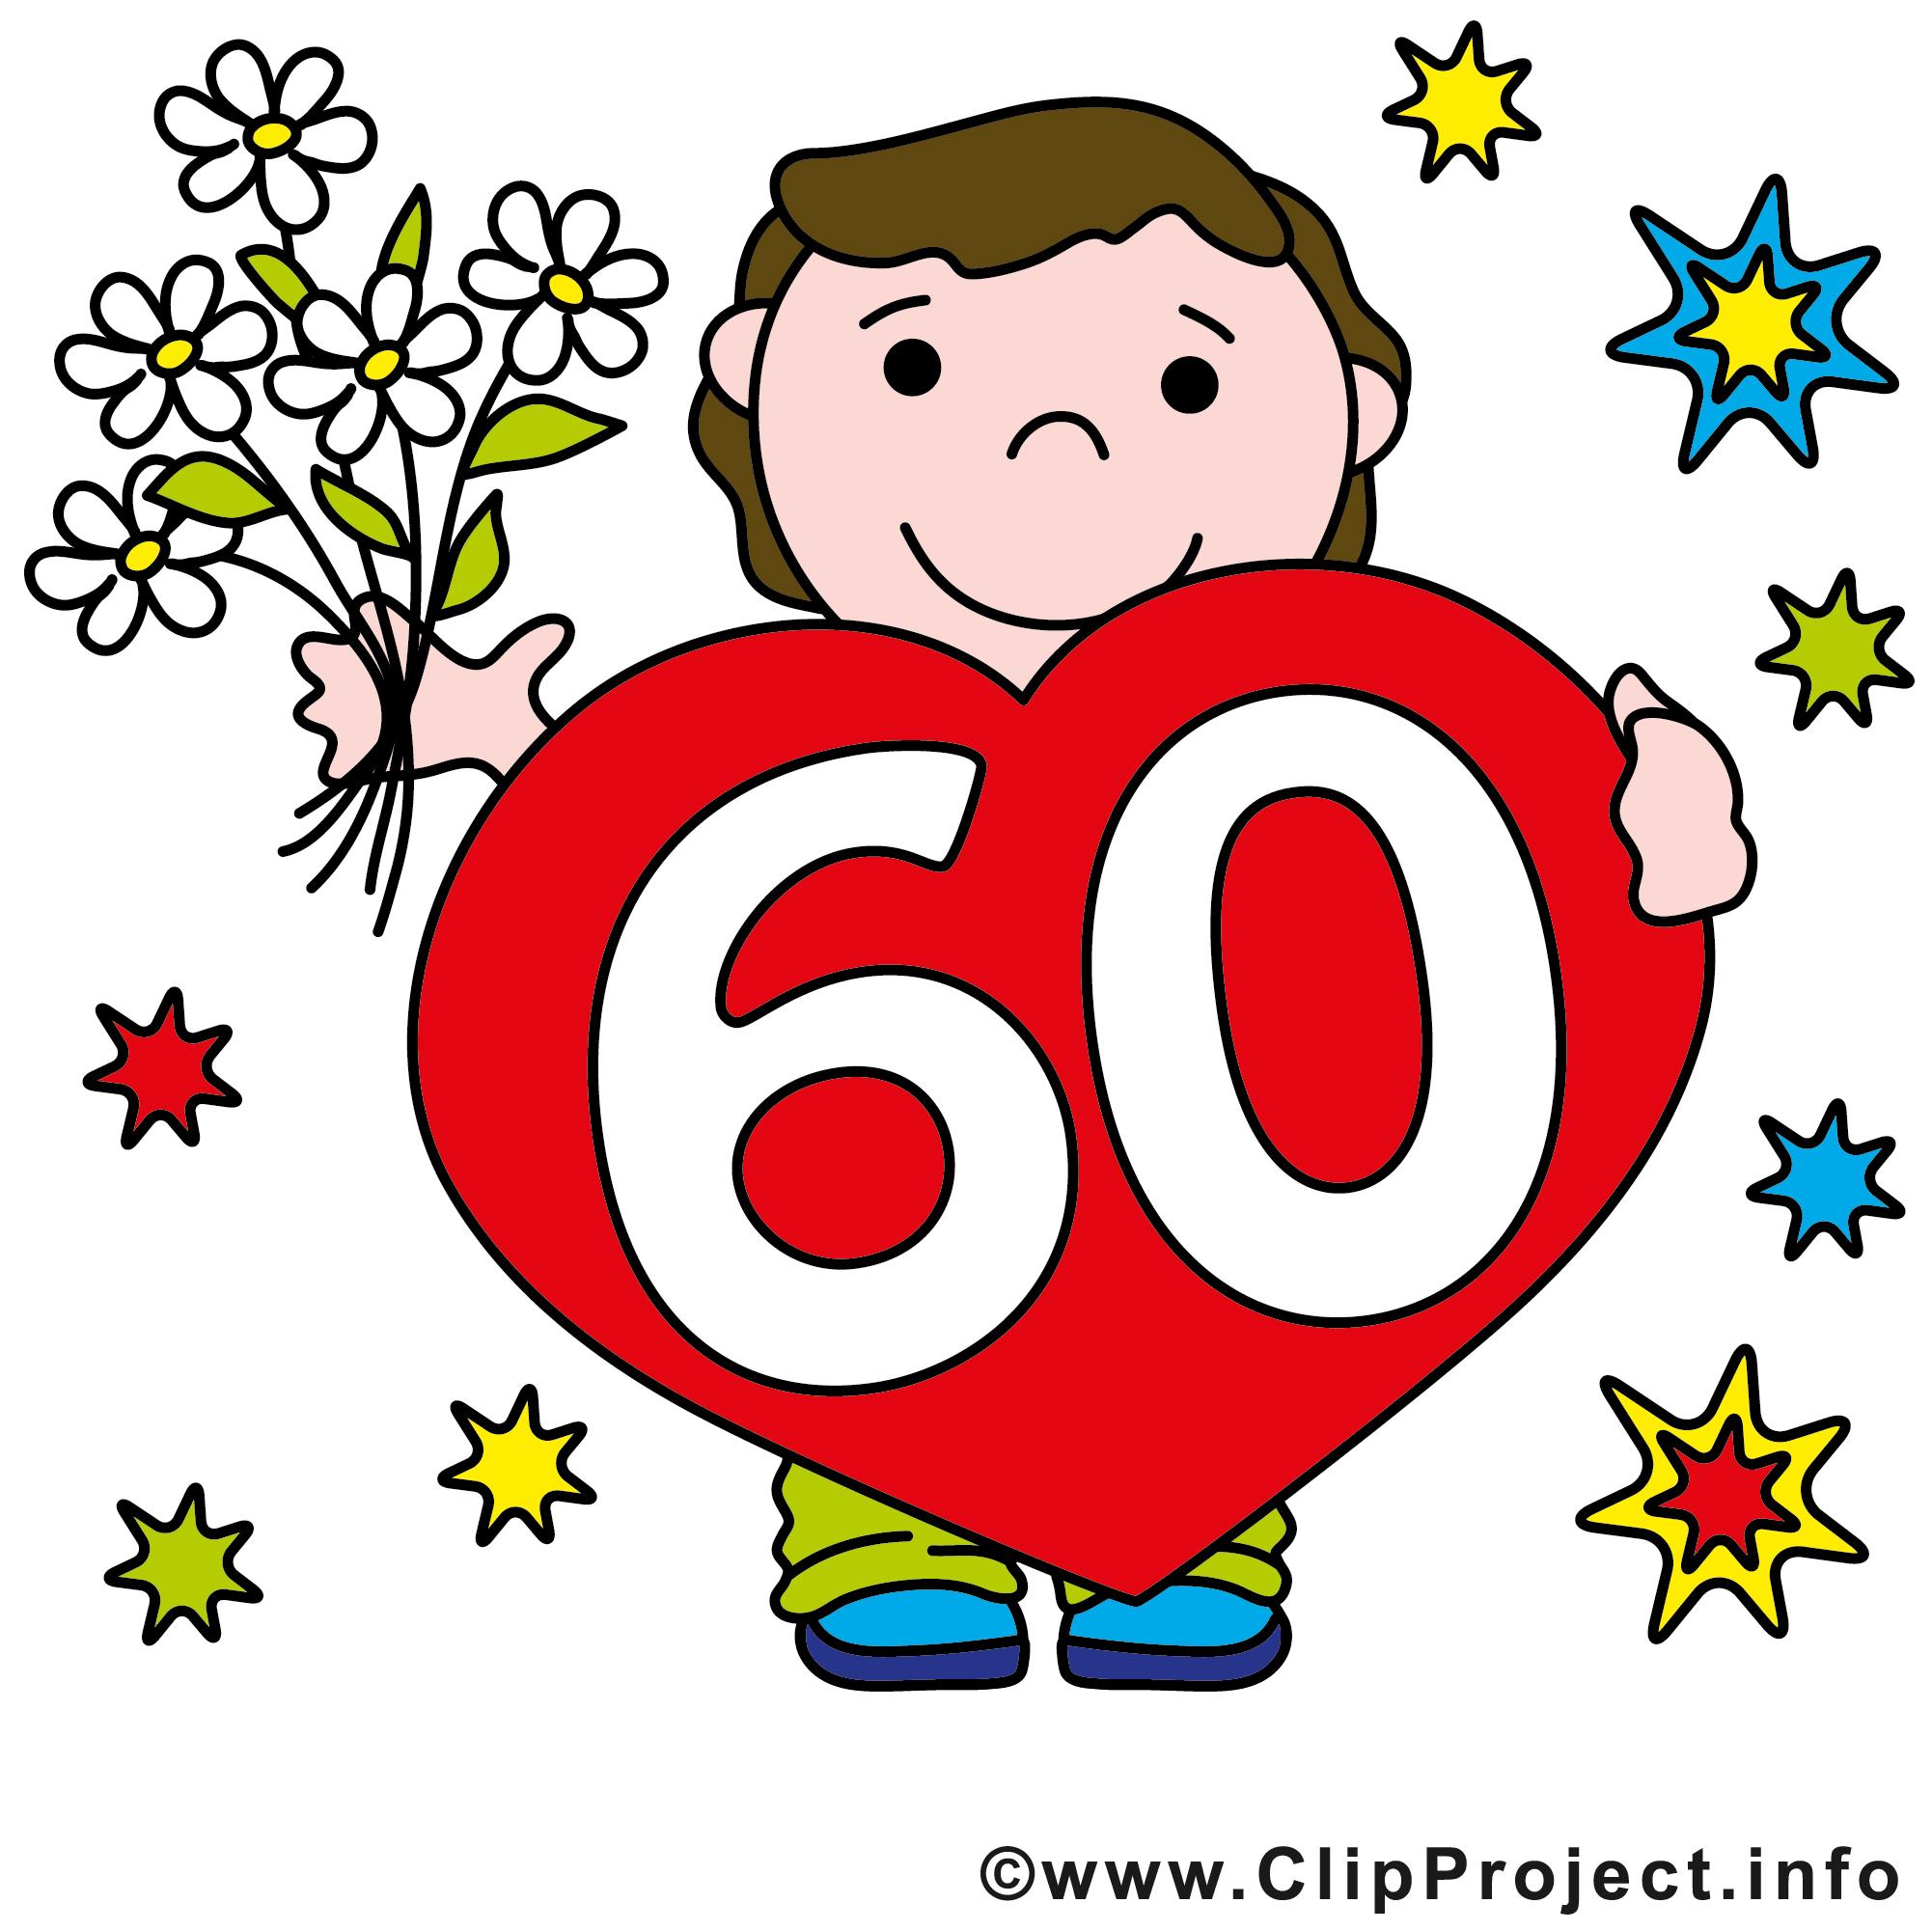 60 clipart clip art stock Anniversaire 60 ans clipart - ClipartFox clip art stock